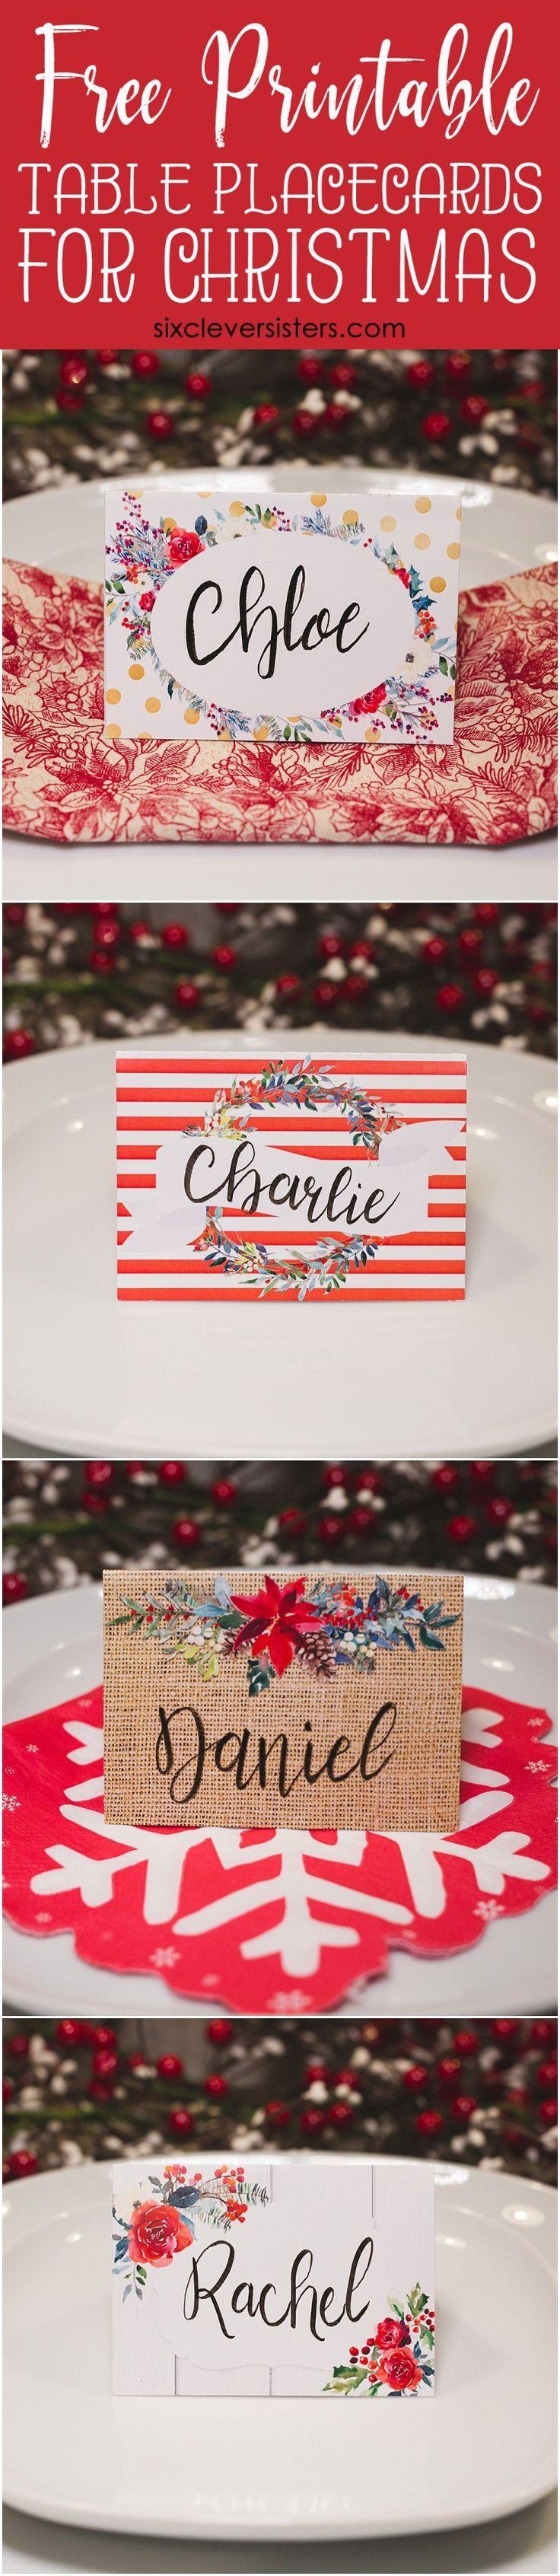 Christmas Table Place Cards Free Printable Six Clever Sisters Christmas Place Cards Diy Christmas Table Christmas Table Settings